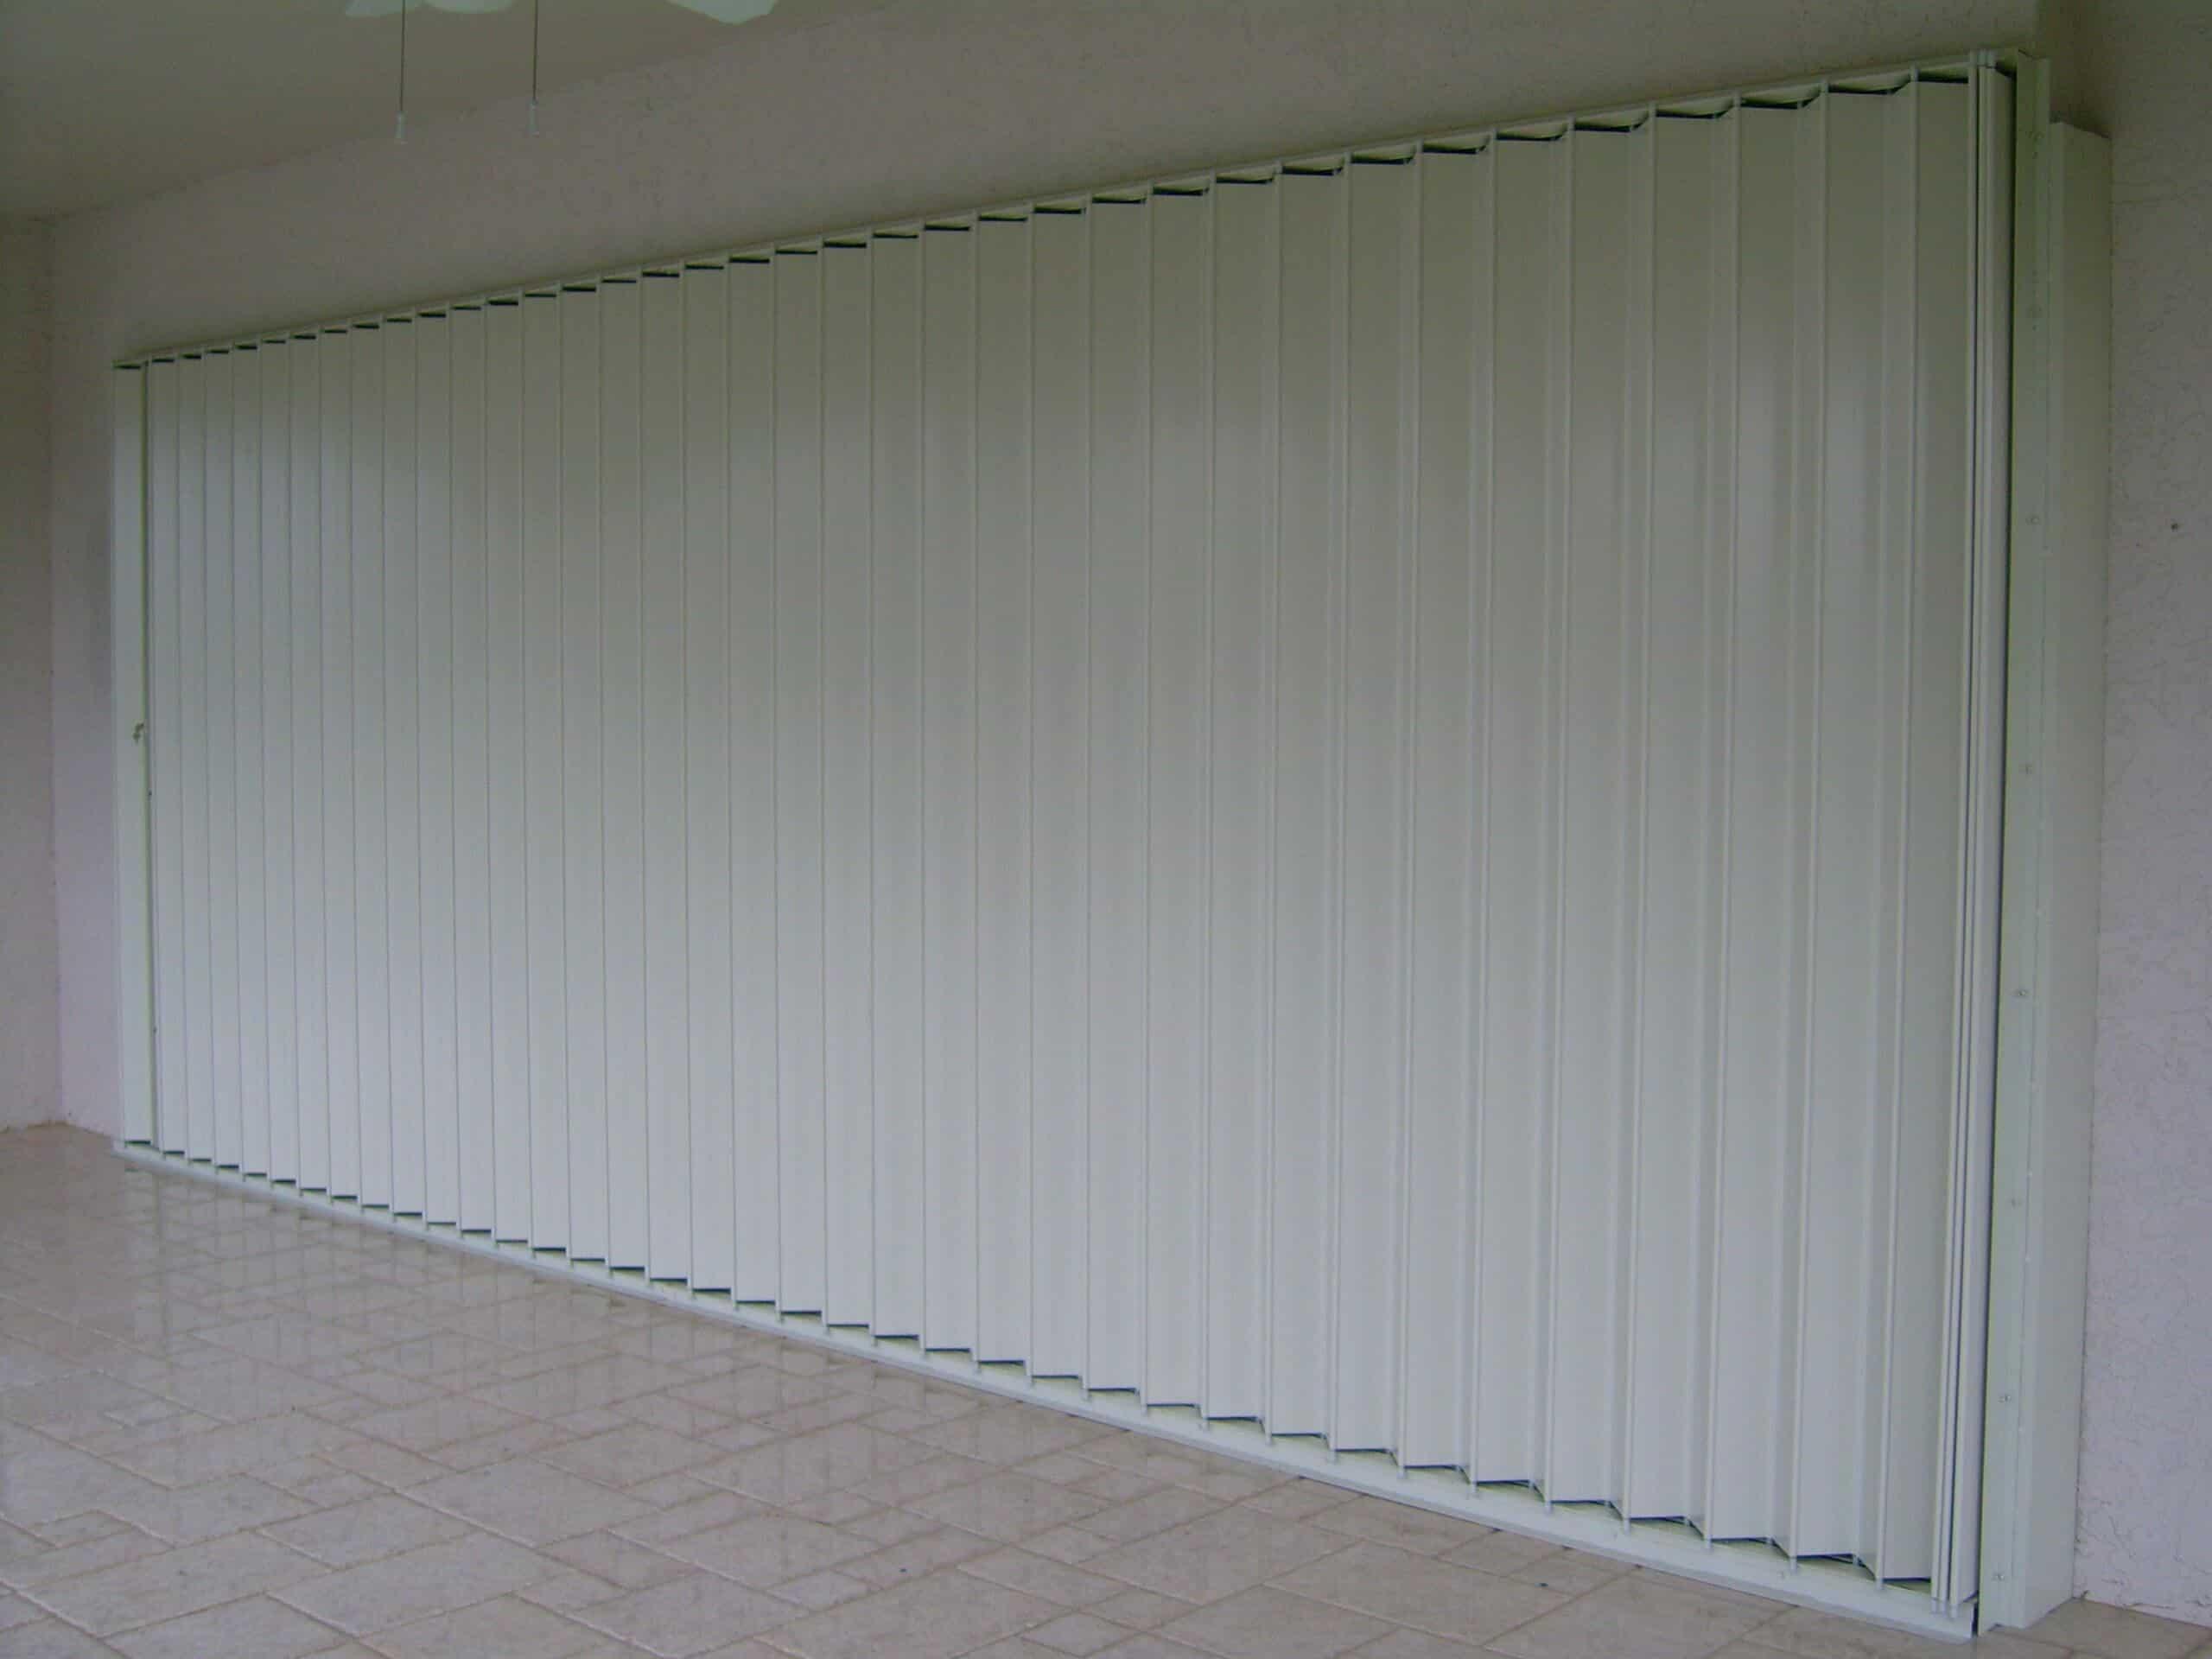 closed accordions protecting glass door